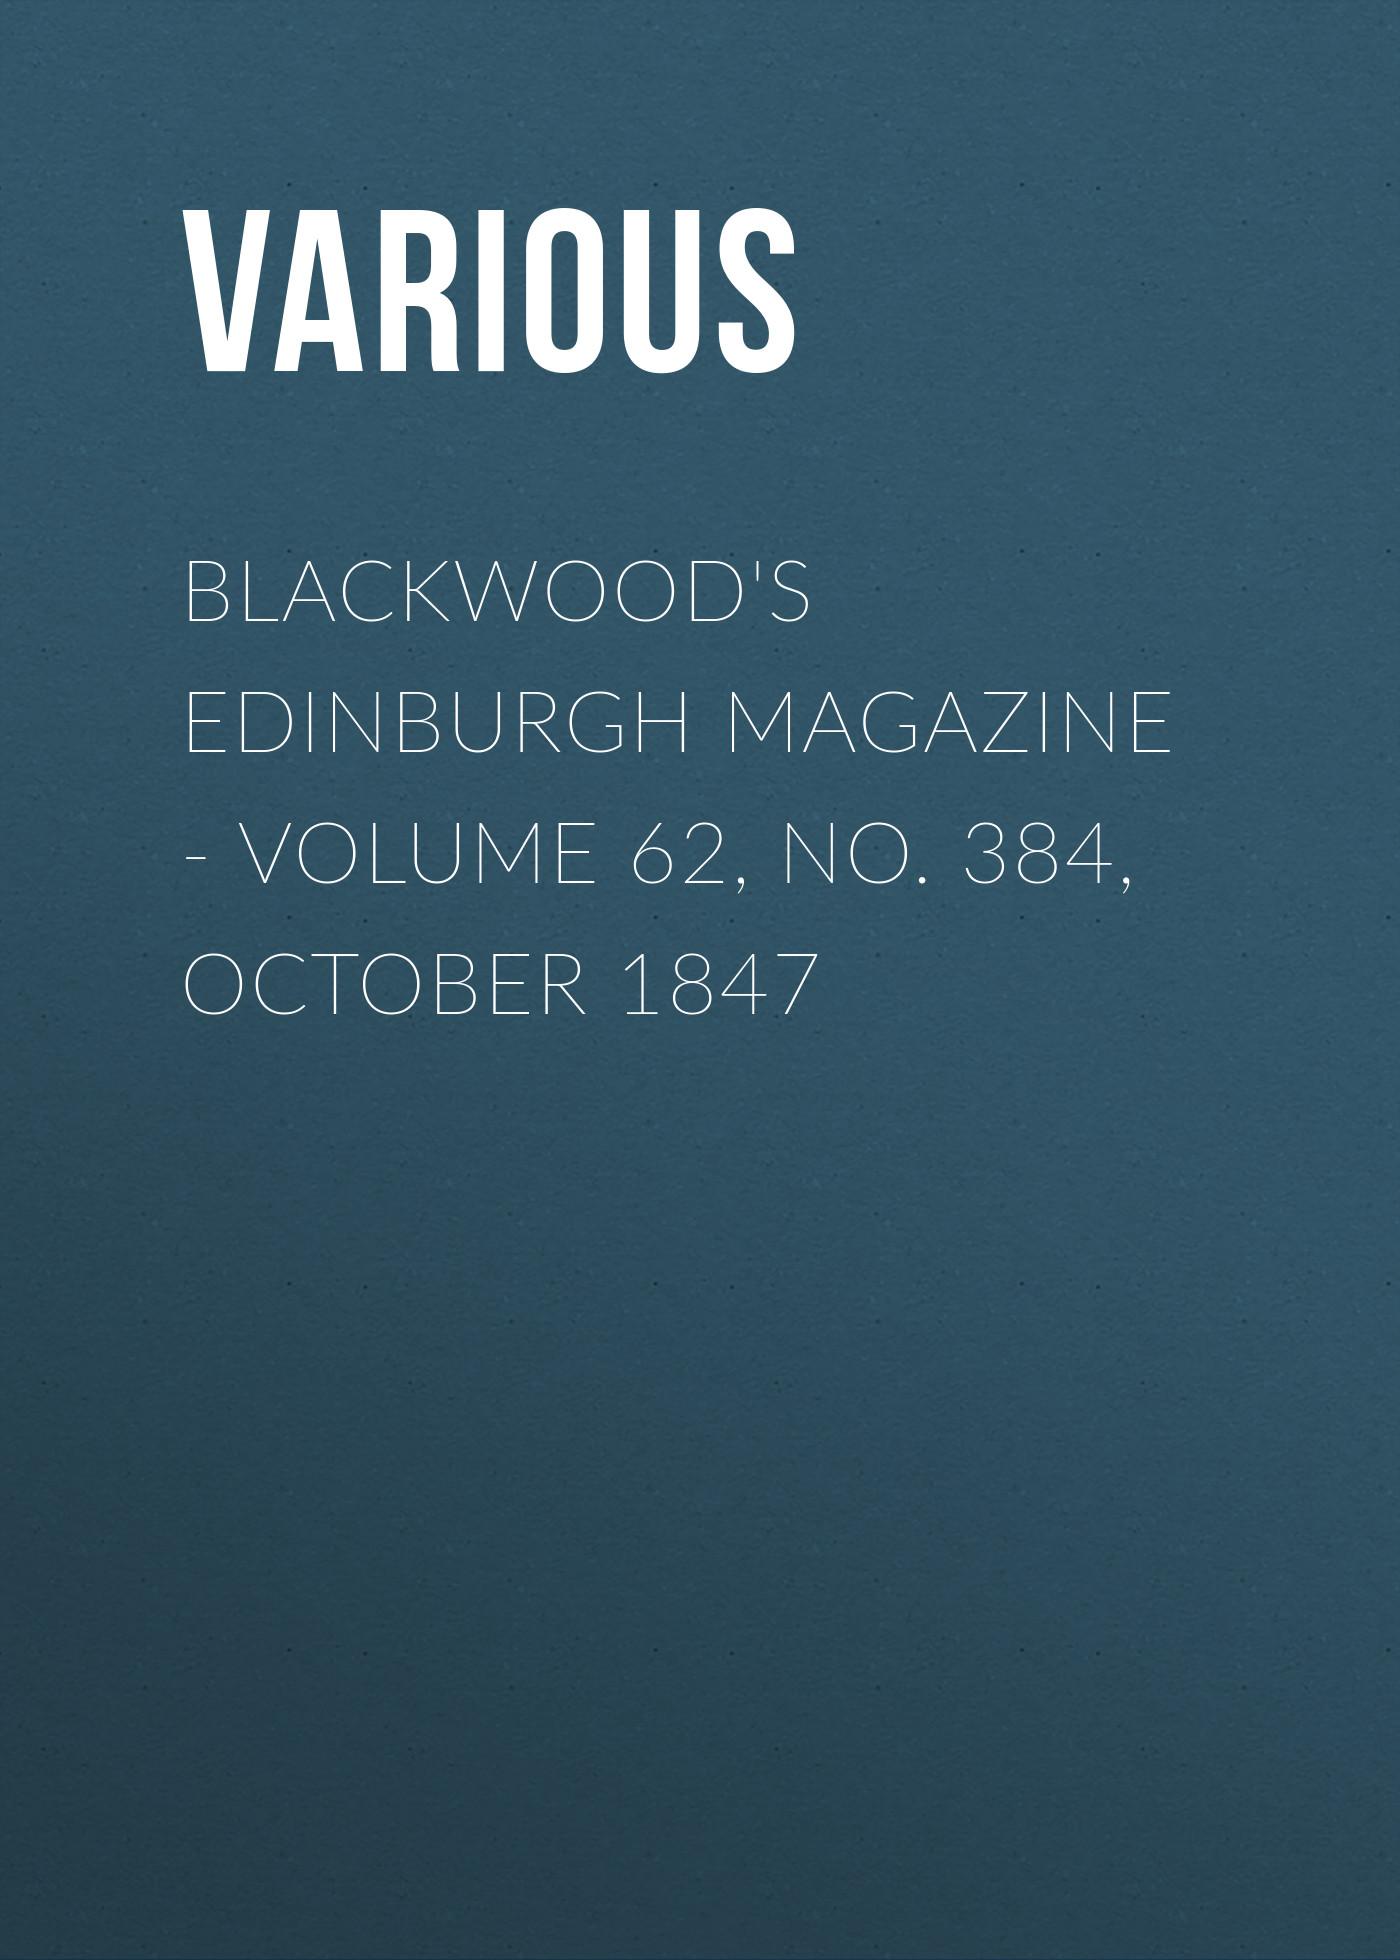 Blackwood's Edinburgh Magazine - Volume 62, No. 384, October 1847